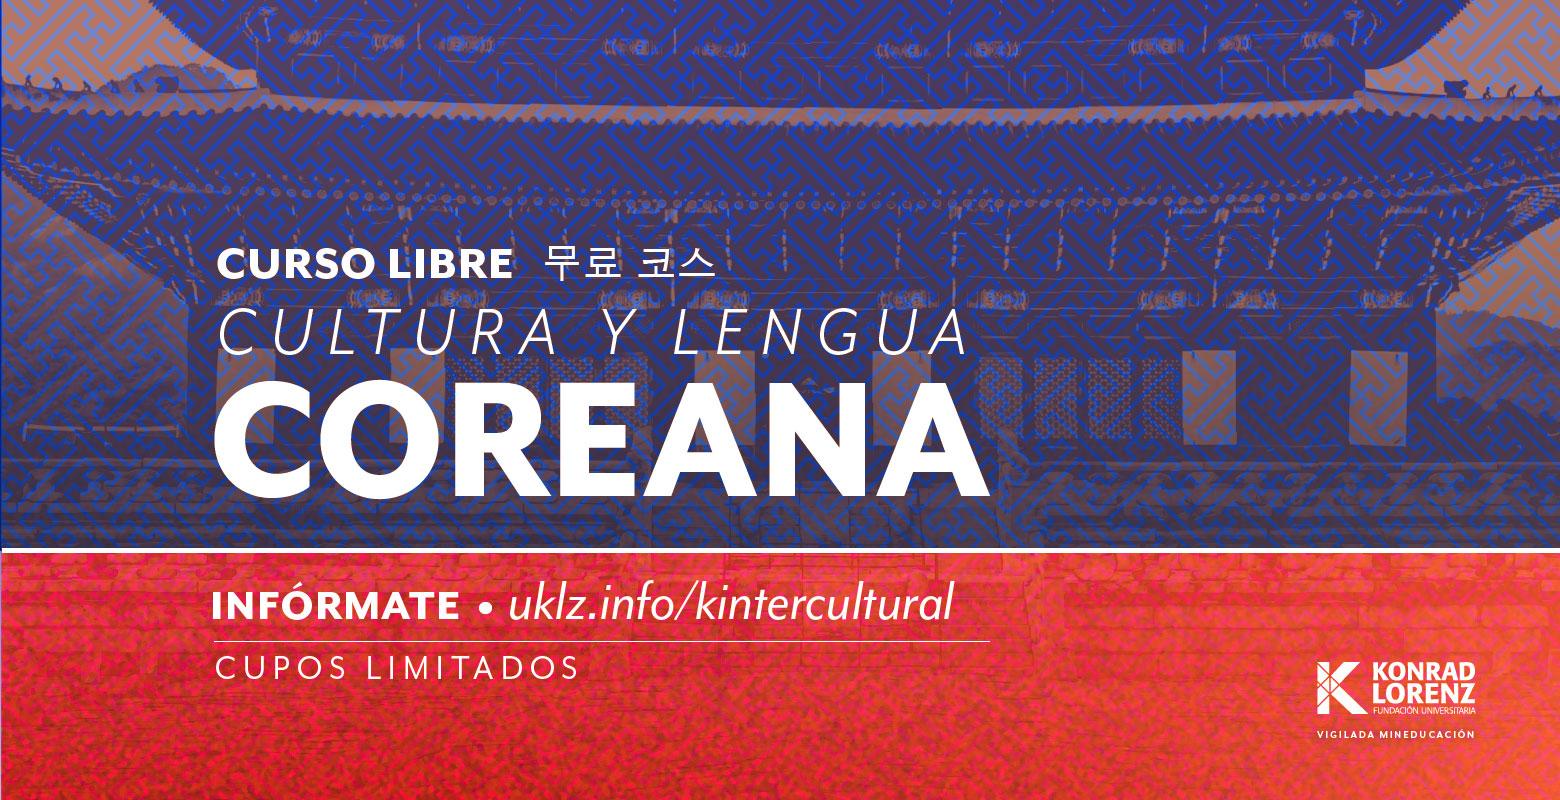 Curso de Cultura y Lengua Coreana